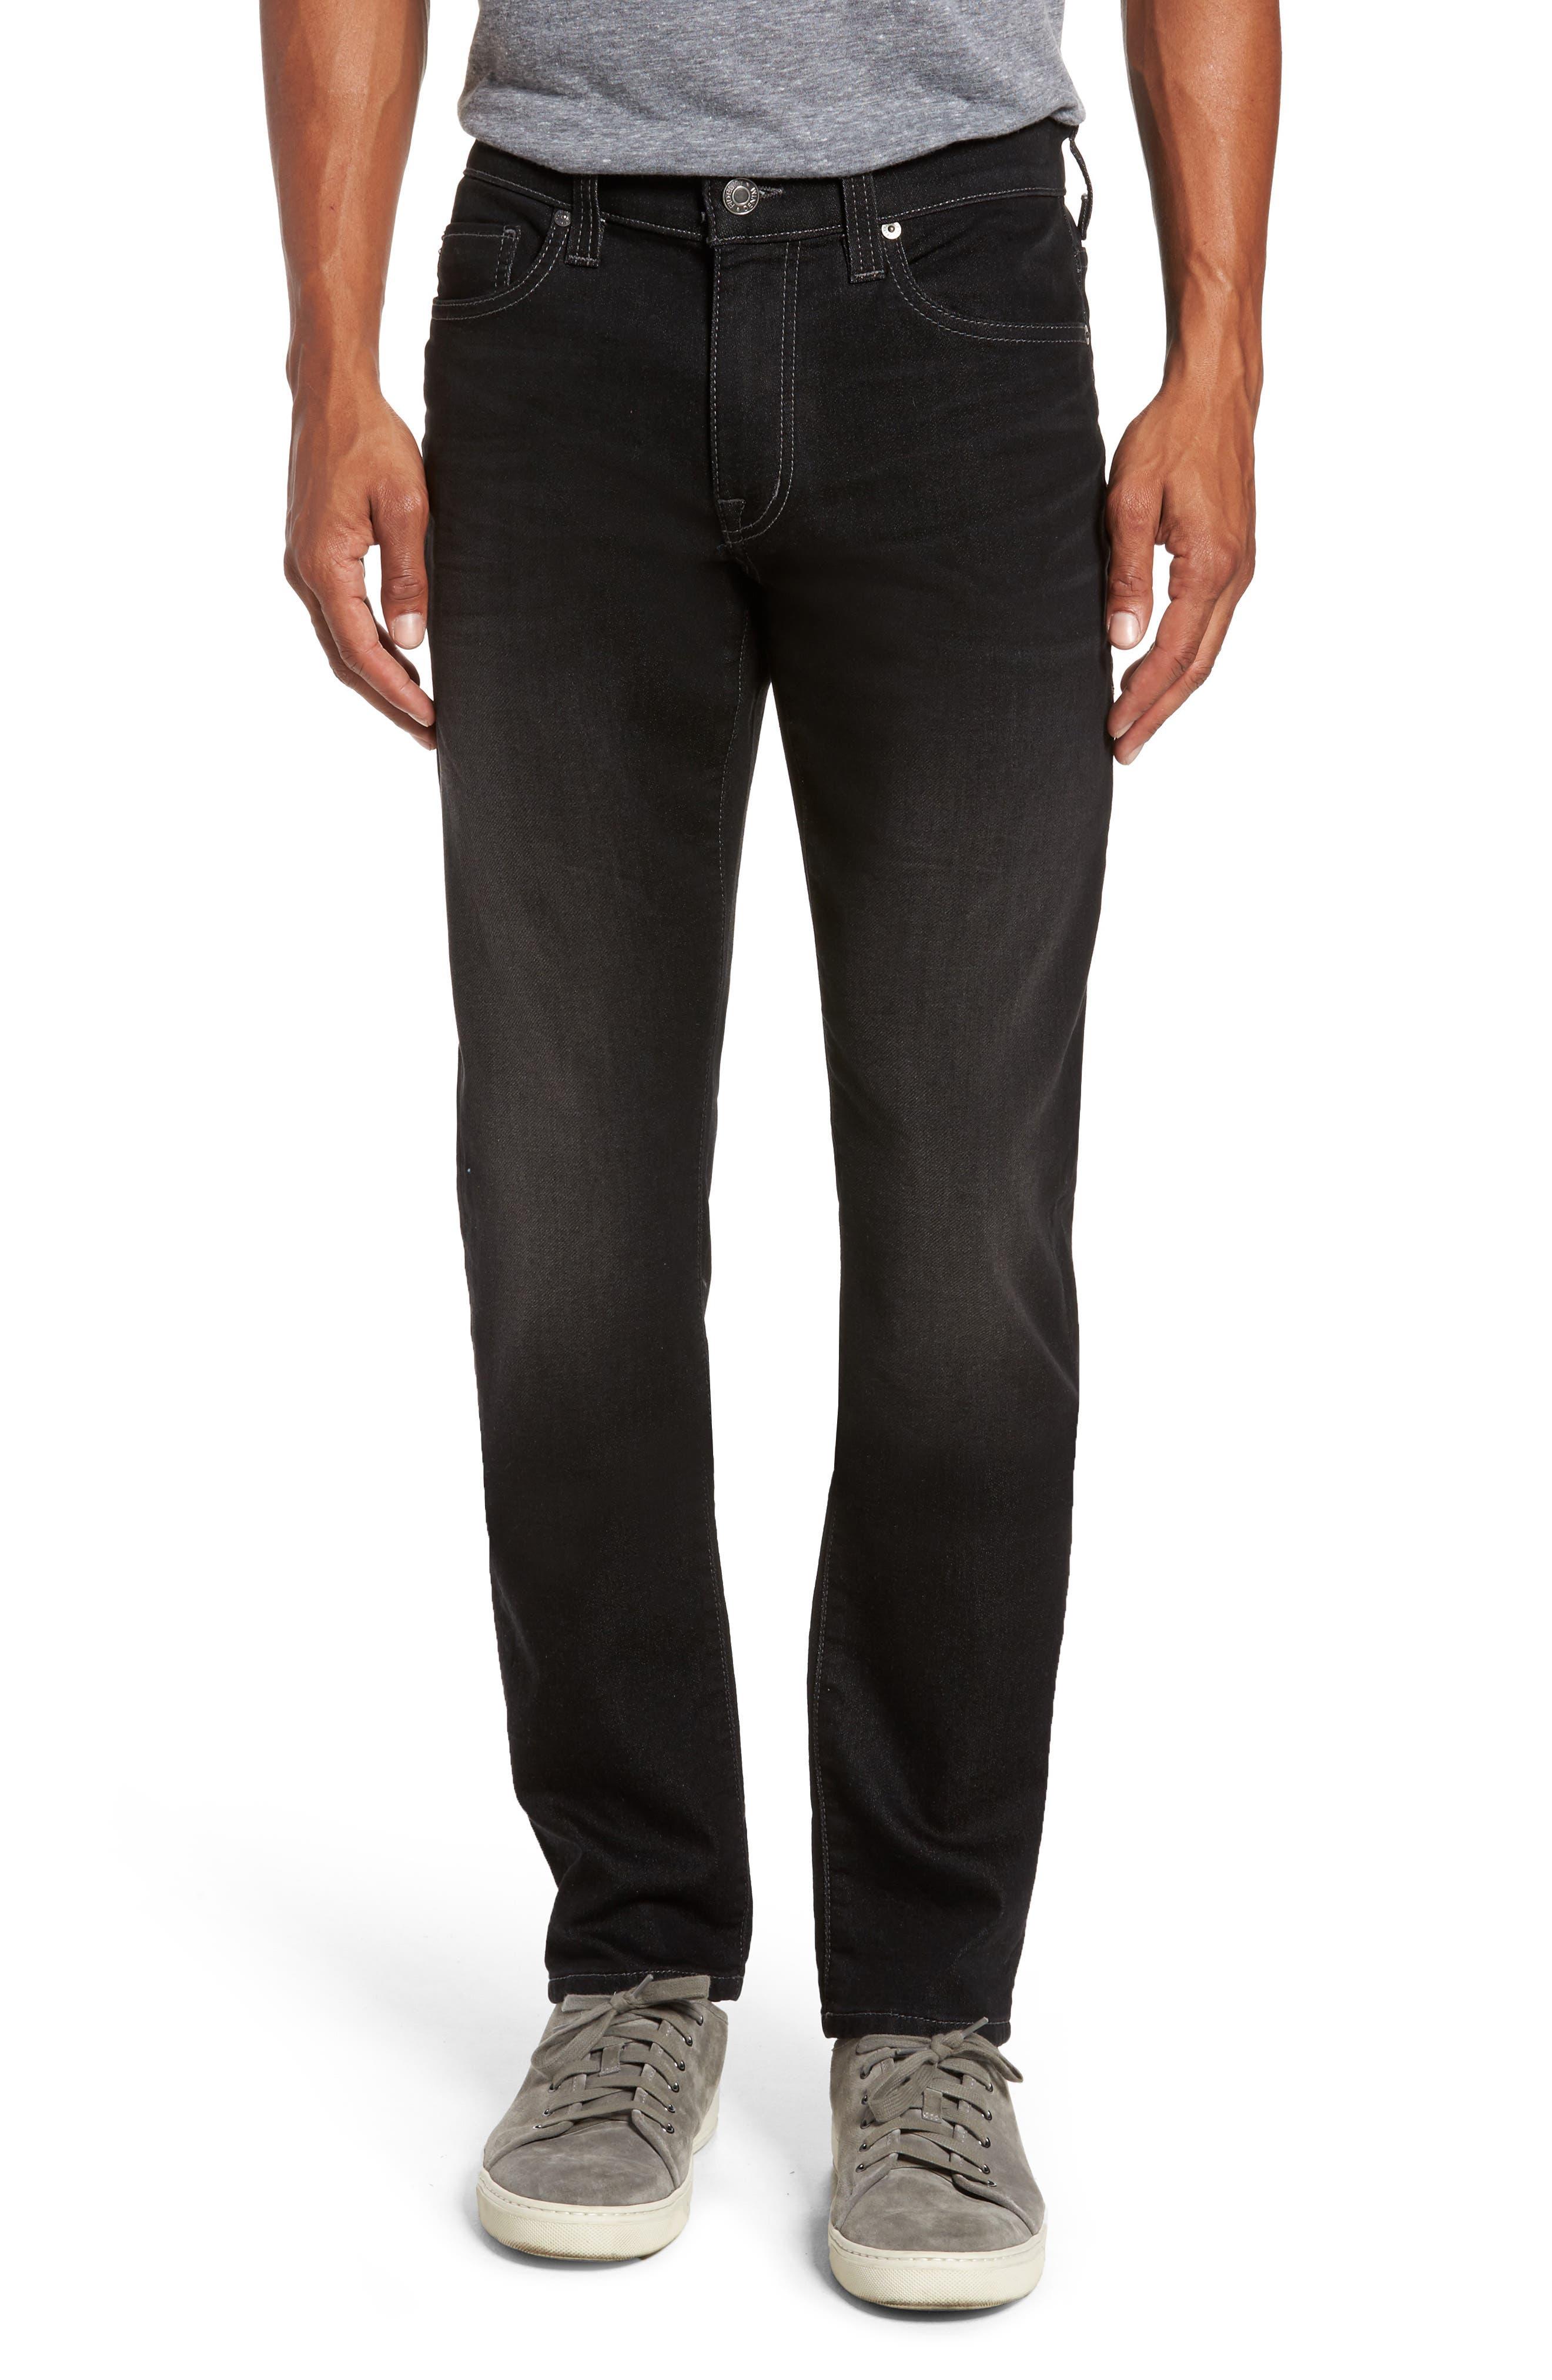 Main Image - Fidelity Denim Torino Slim Fit Jeans (Oxy Black on Black)